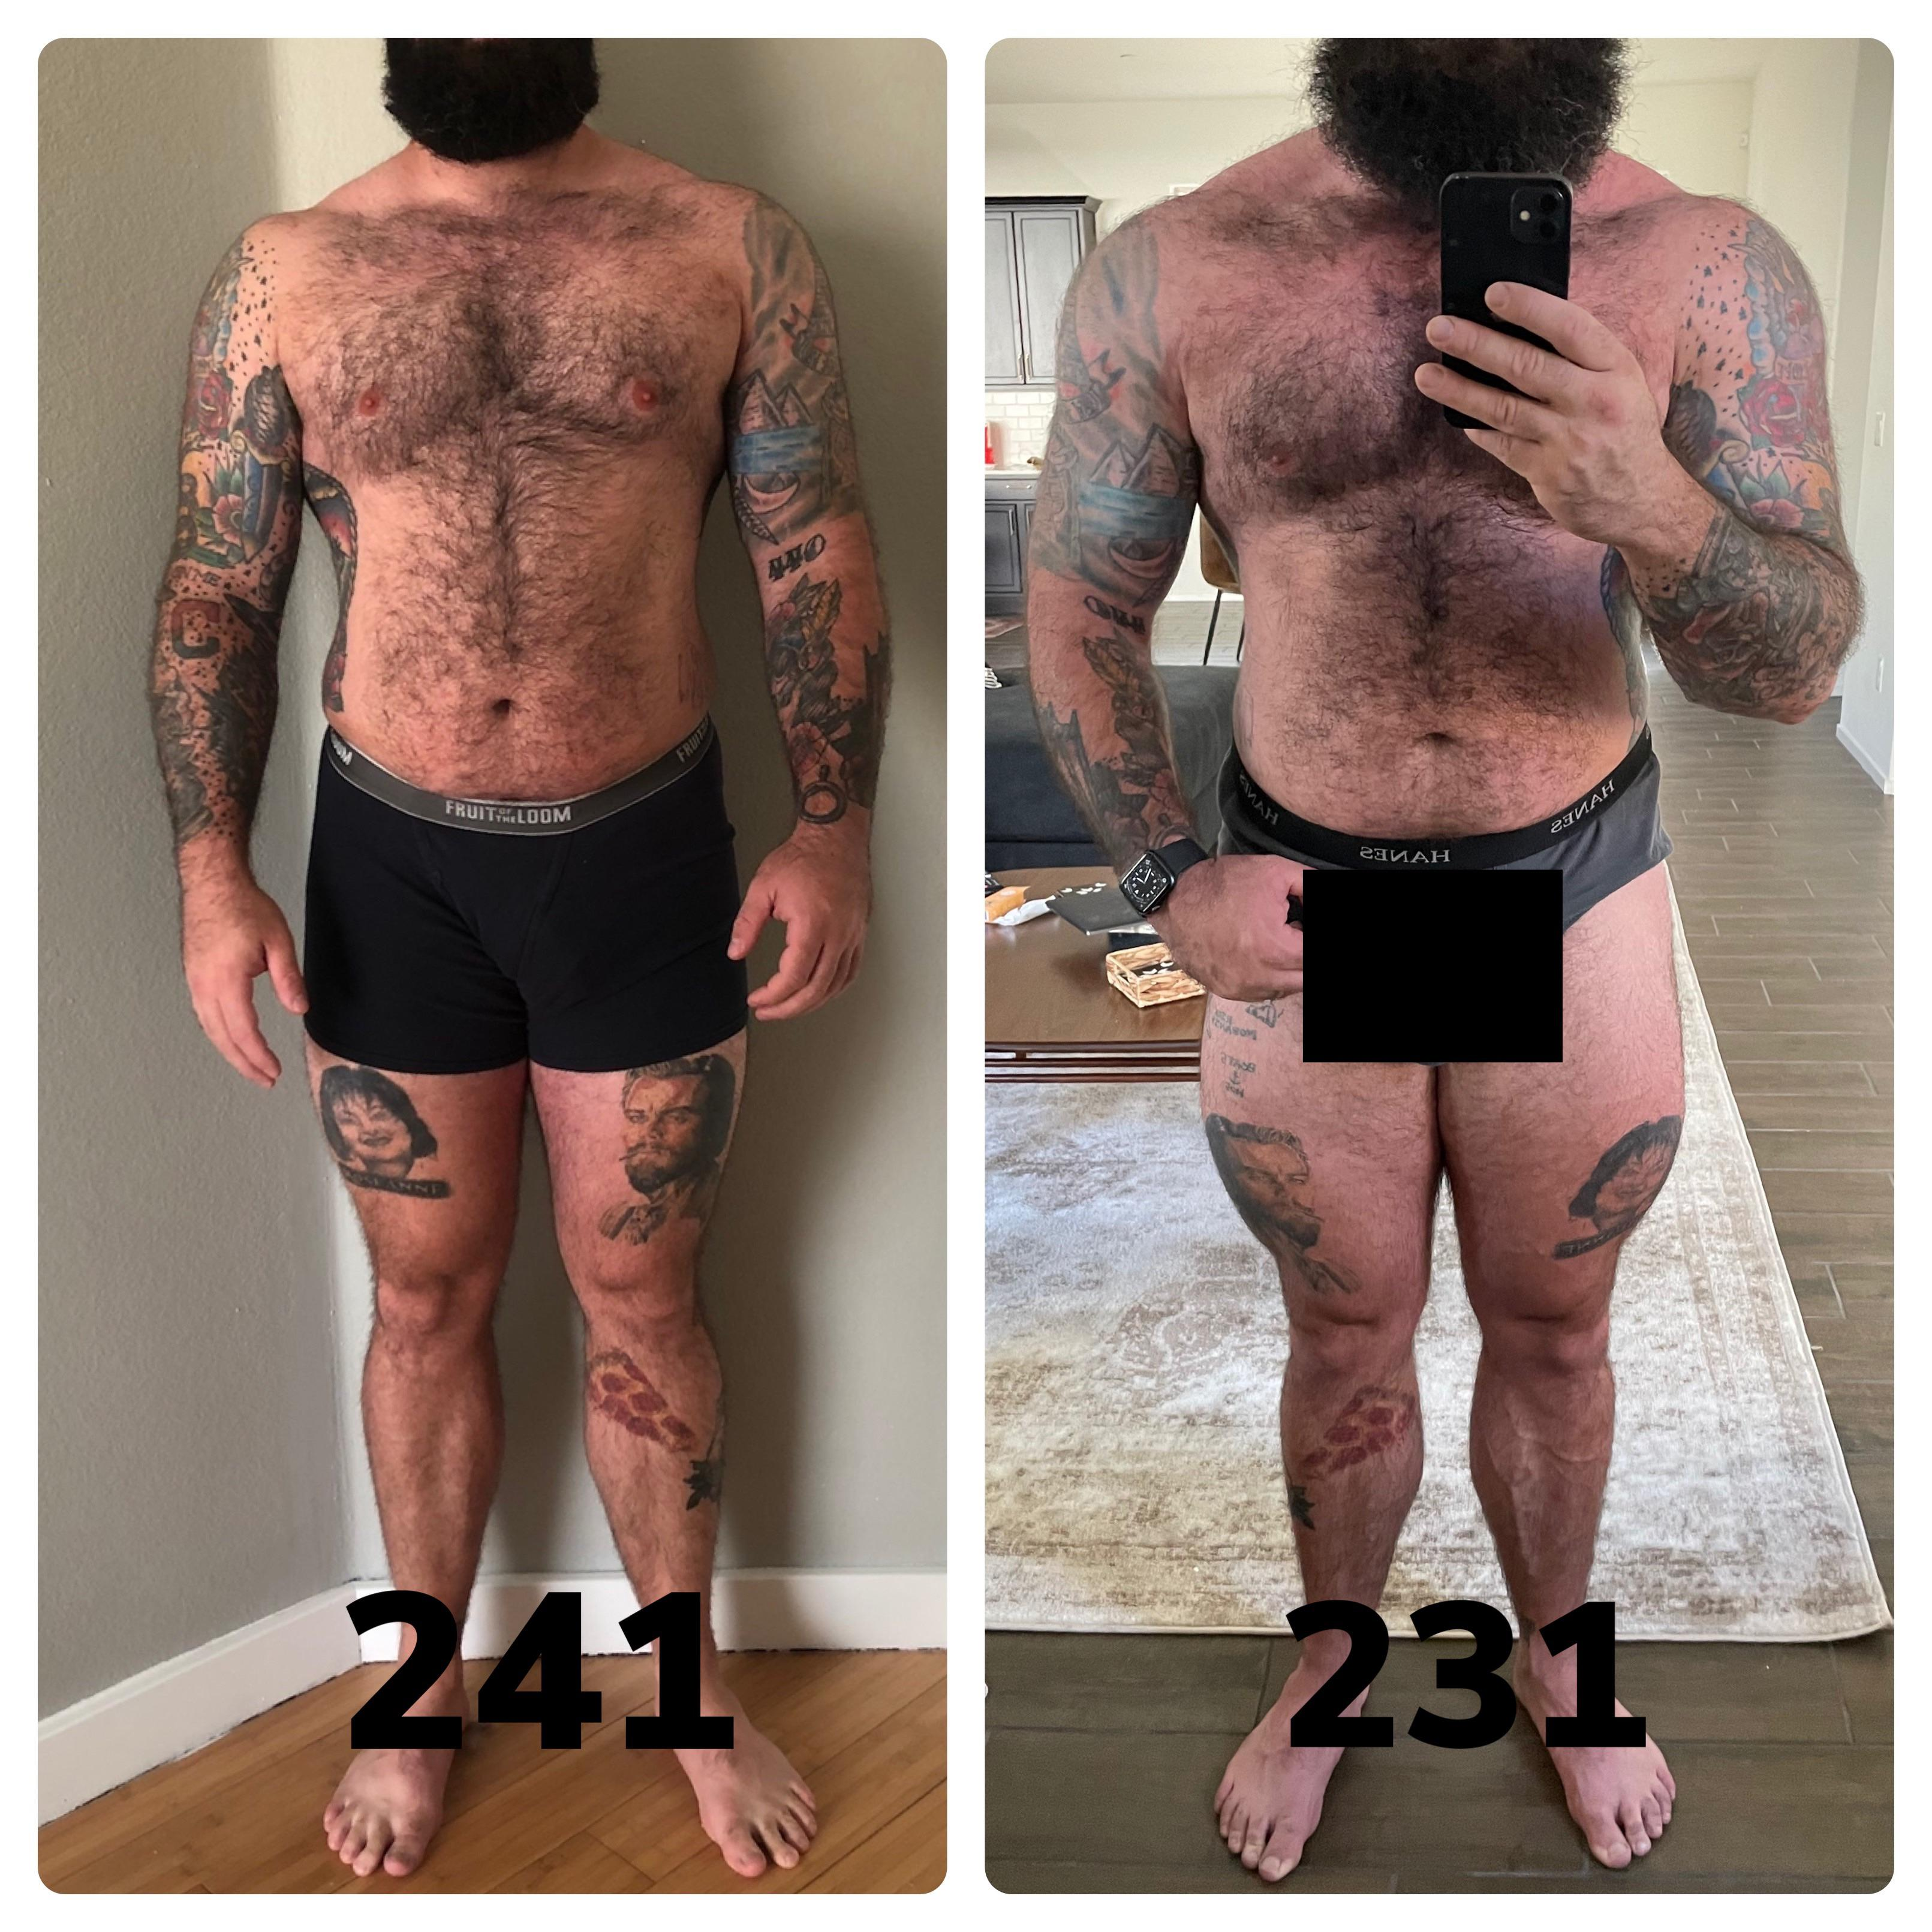 6 foot Male 10 lbs Weight Loss 241 lbs to 231 lbs